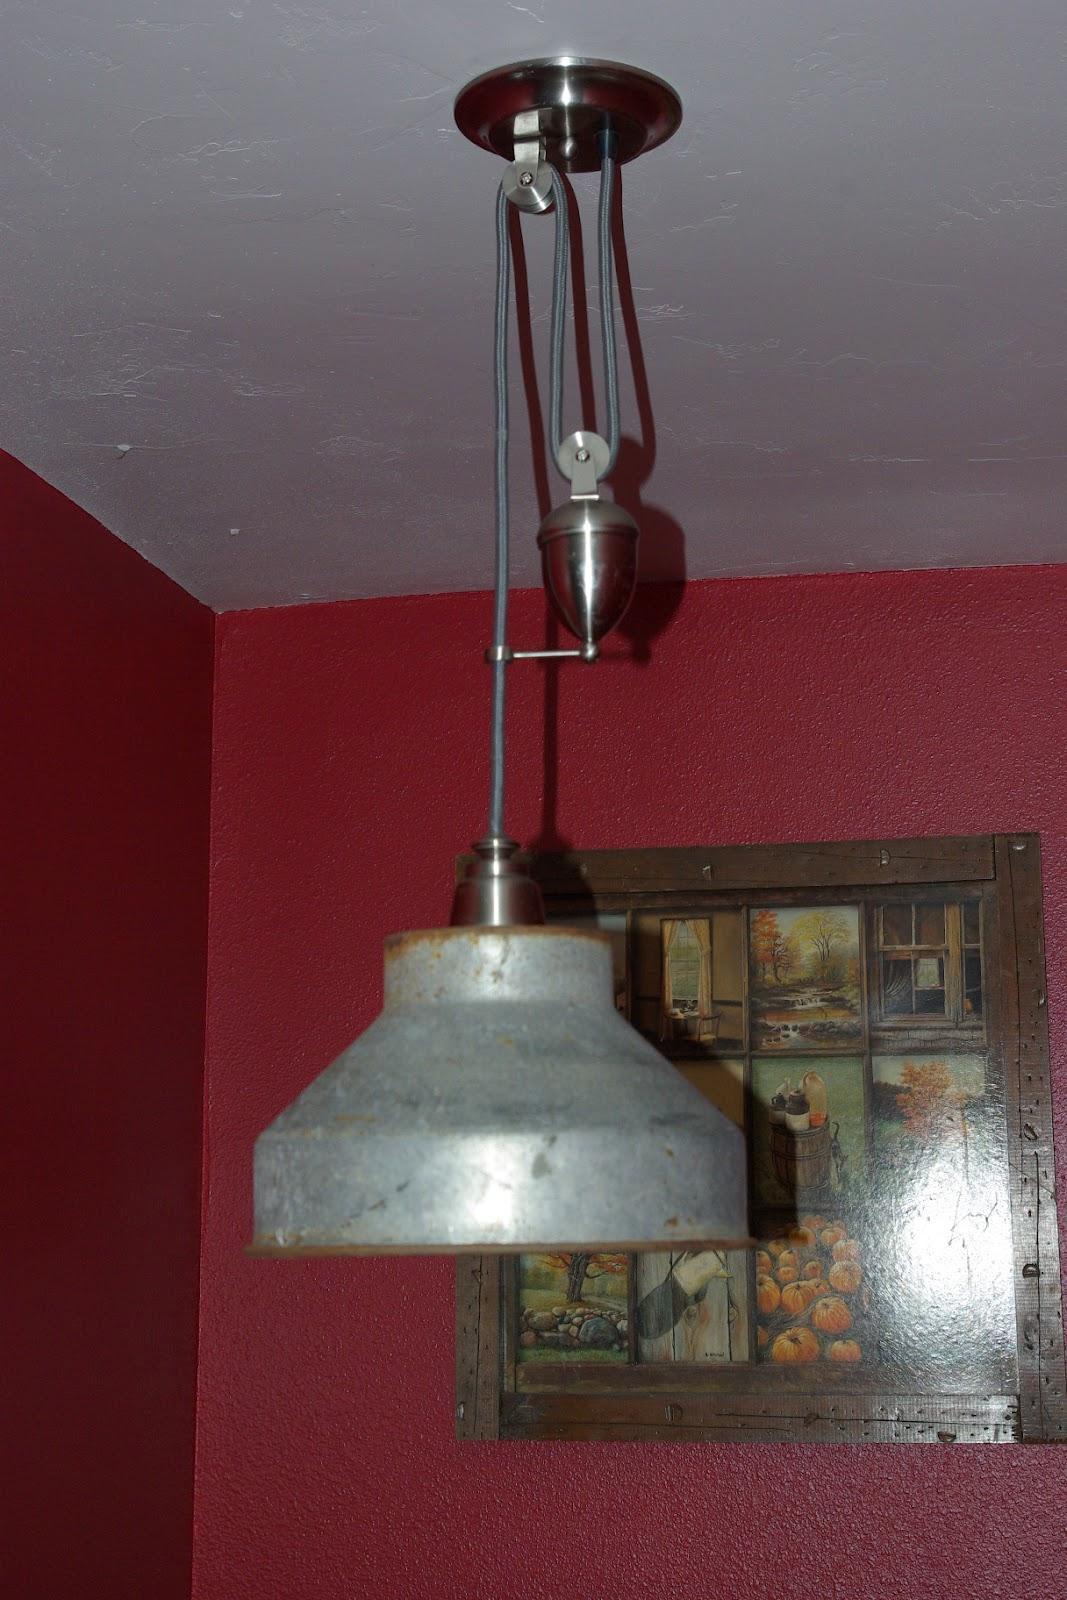 reclaimed rustics pulley light fixture. Black Bedroom Furniture Sets. Home Design Ideas